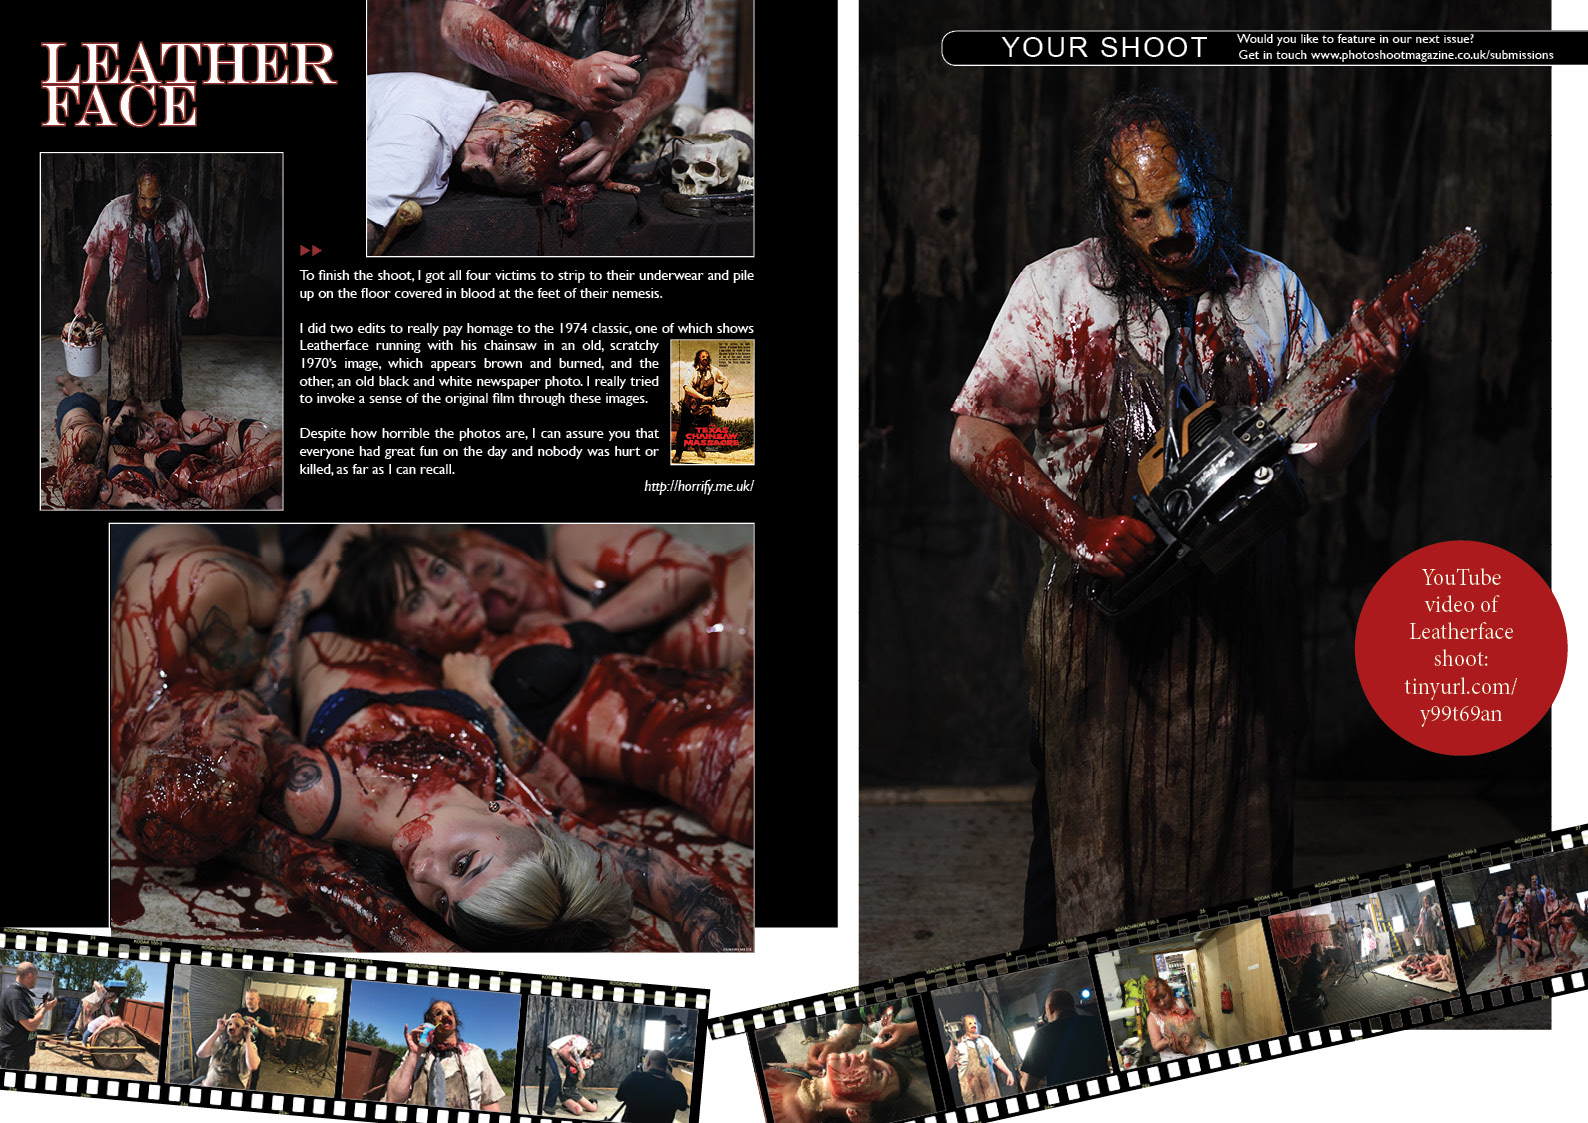 Leatherface_The Texas Chainsaw Massacre - HorrifyMe